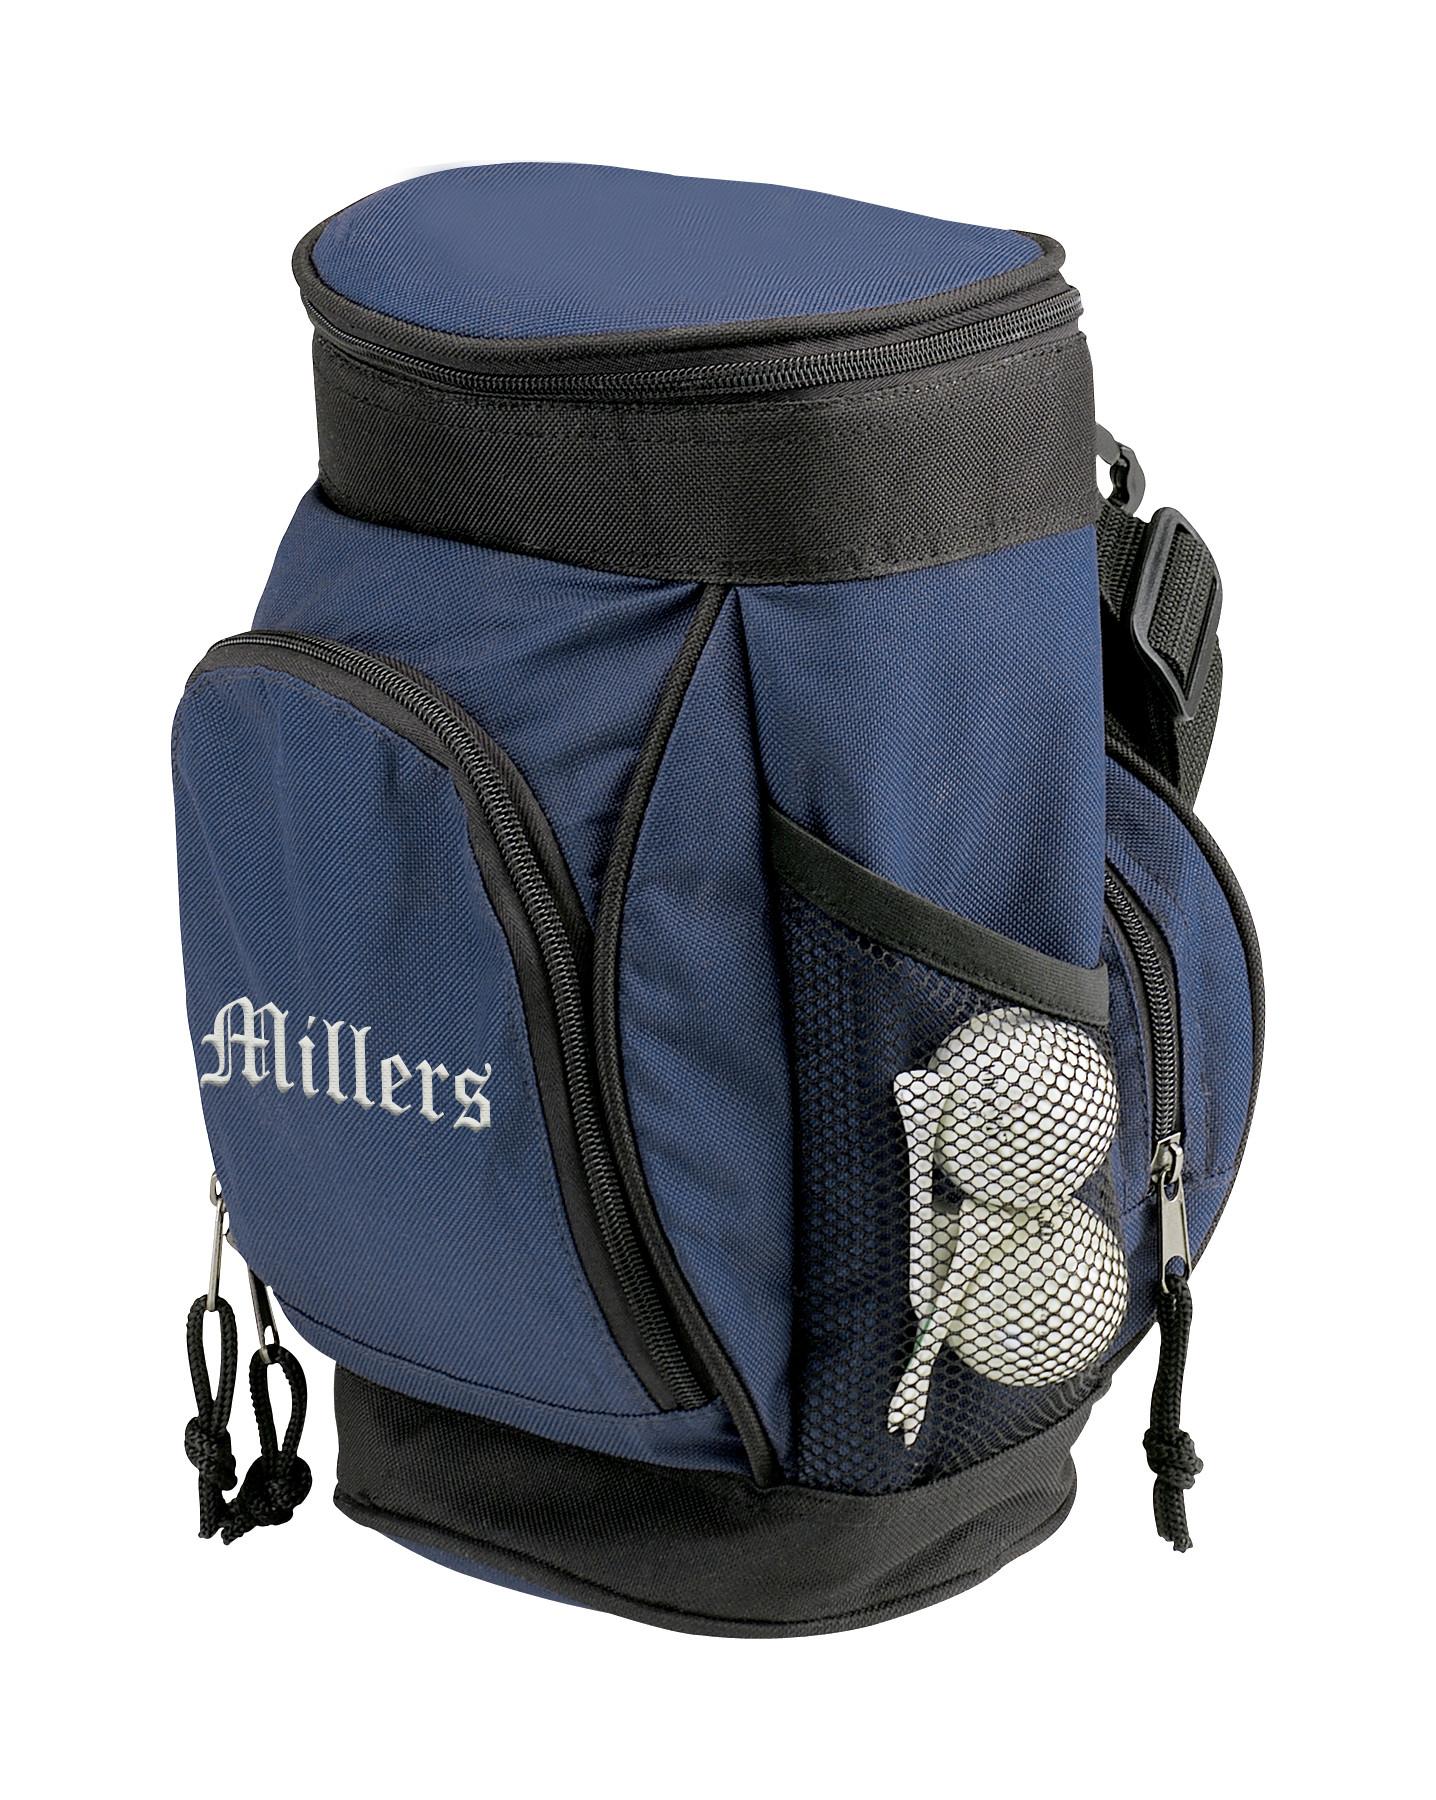 6 Pack Cooler ~ Pack insulated golfer cooler bag hansonellis